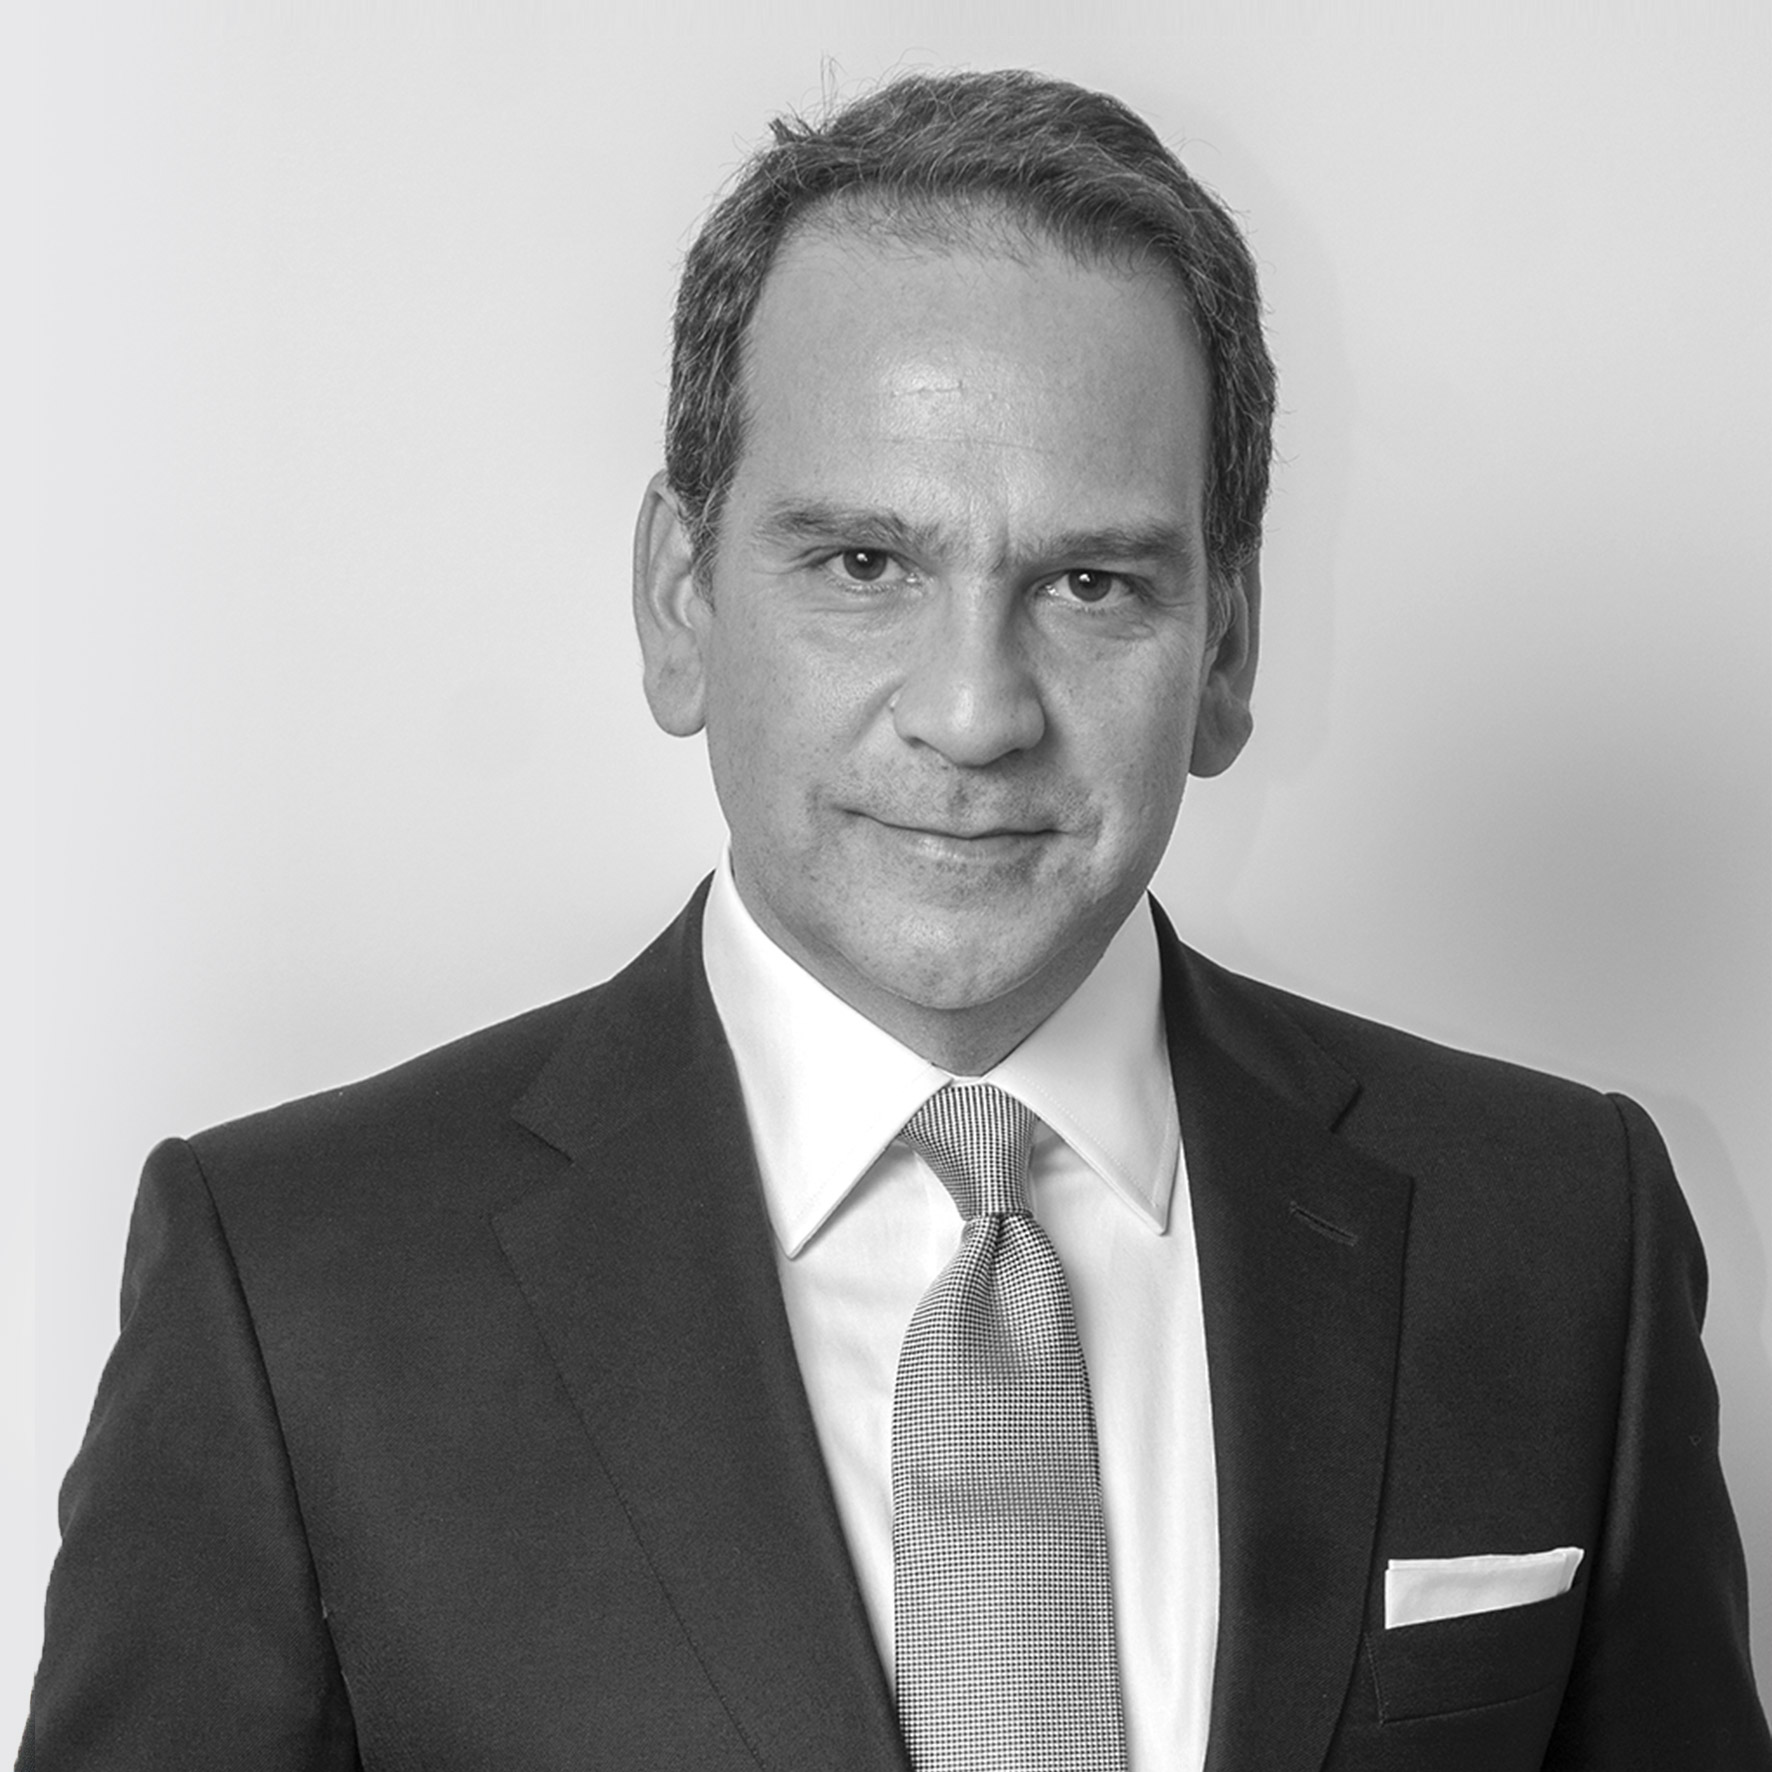 Georgios Petrochilos